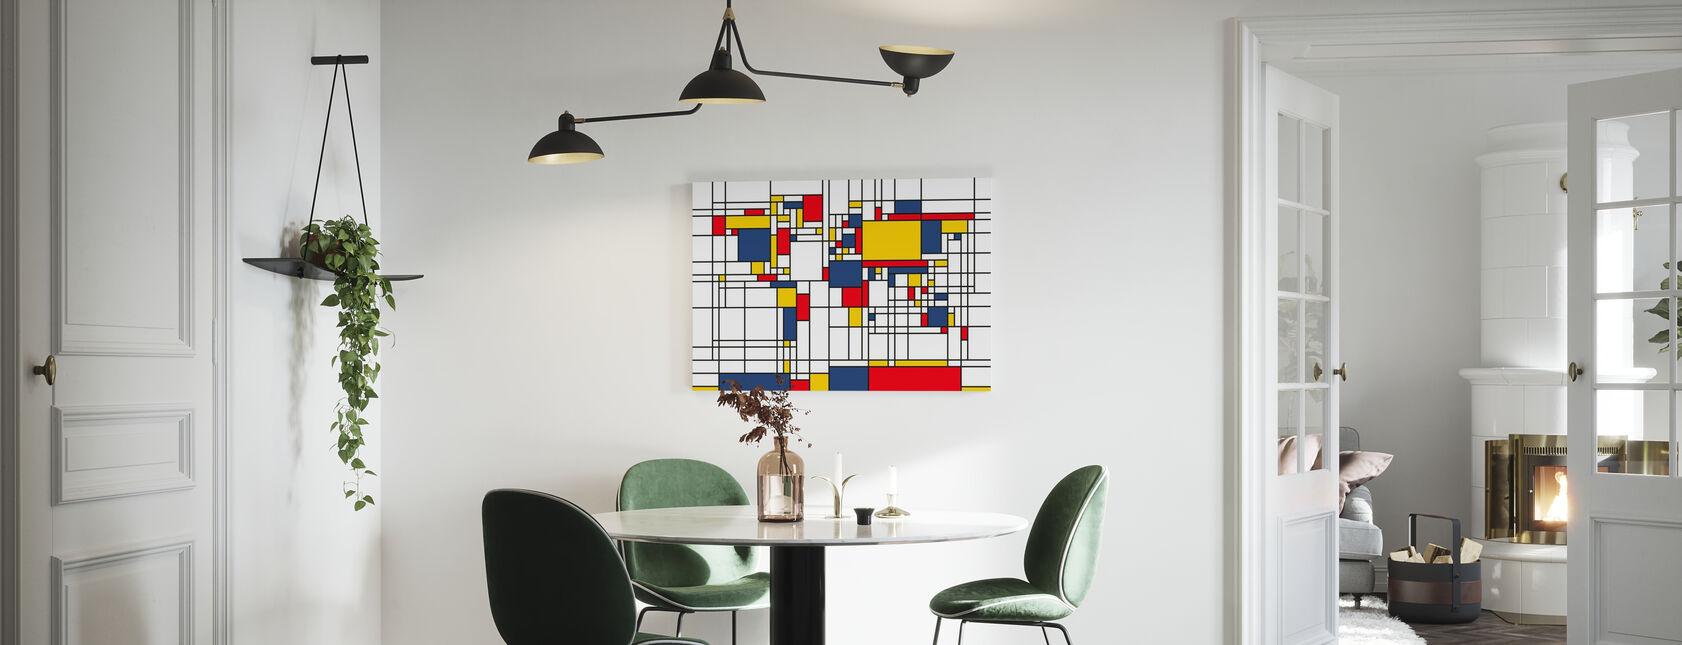 Piet Mondrian Style World Map - Canvas print - Kitchen